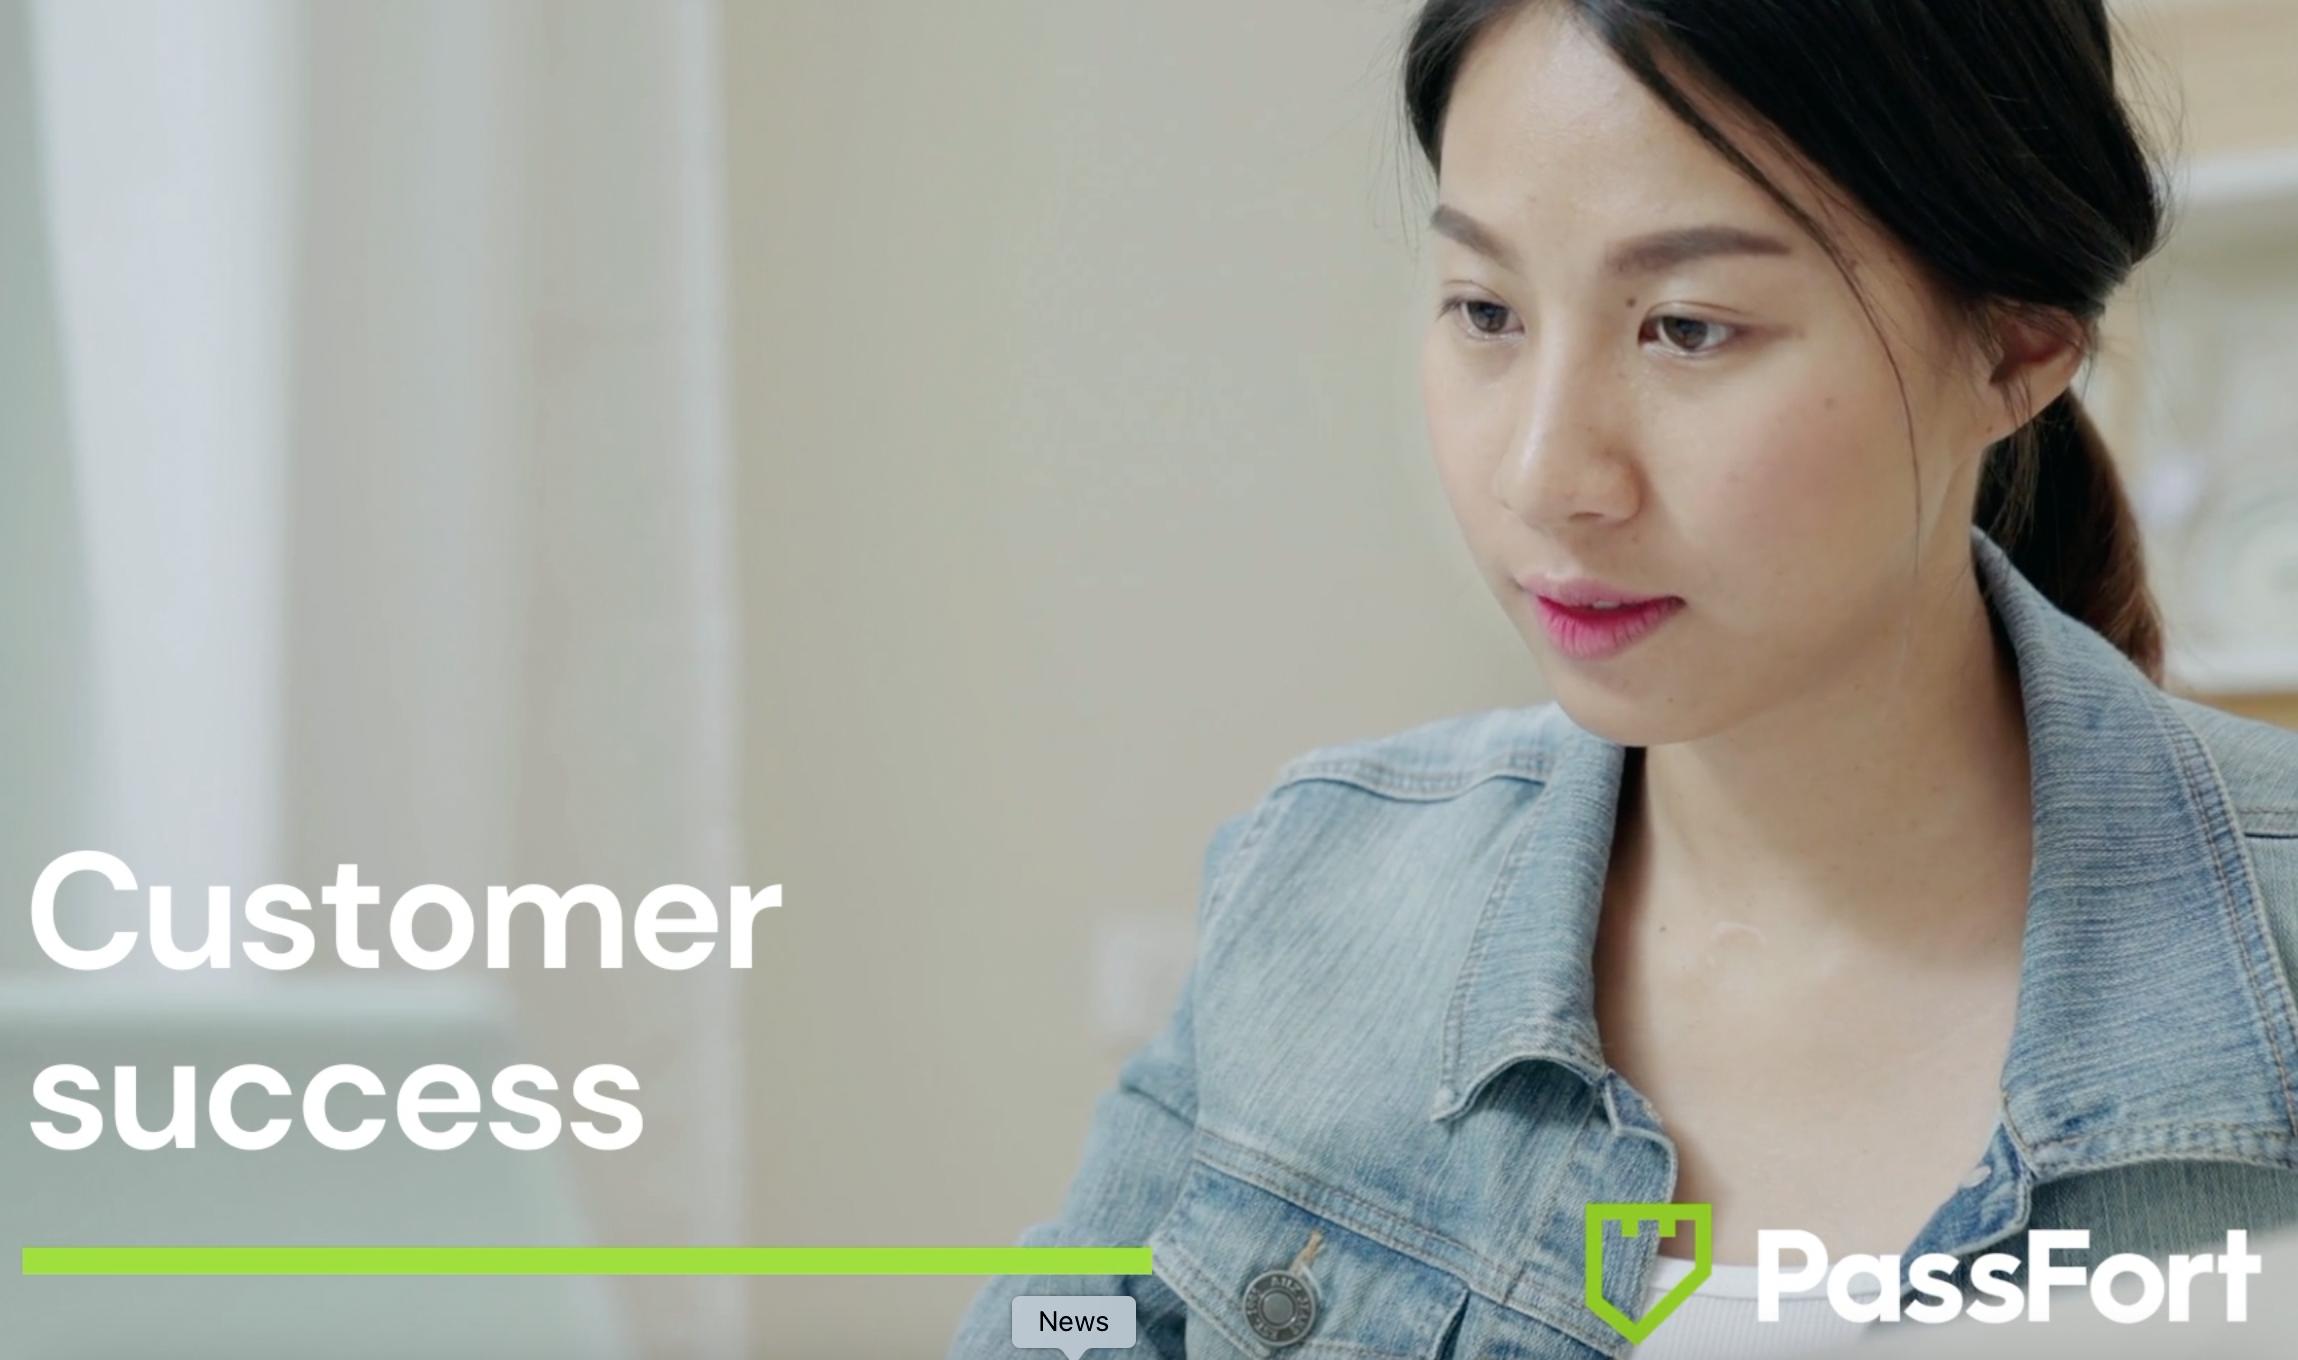 PassFort customer success 2021